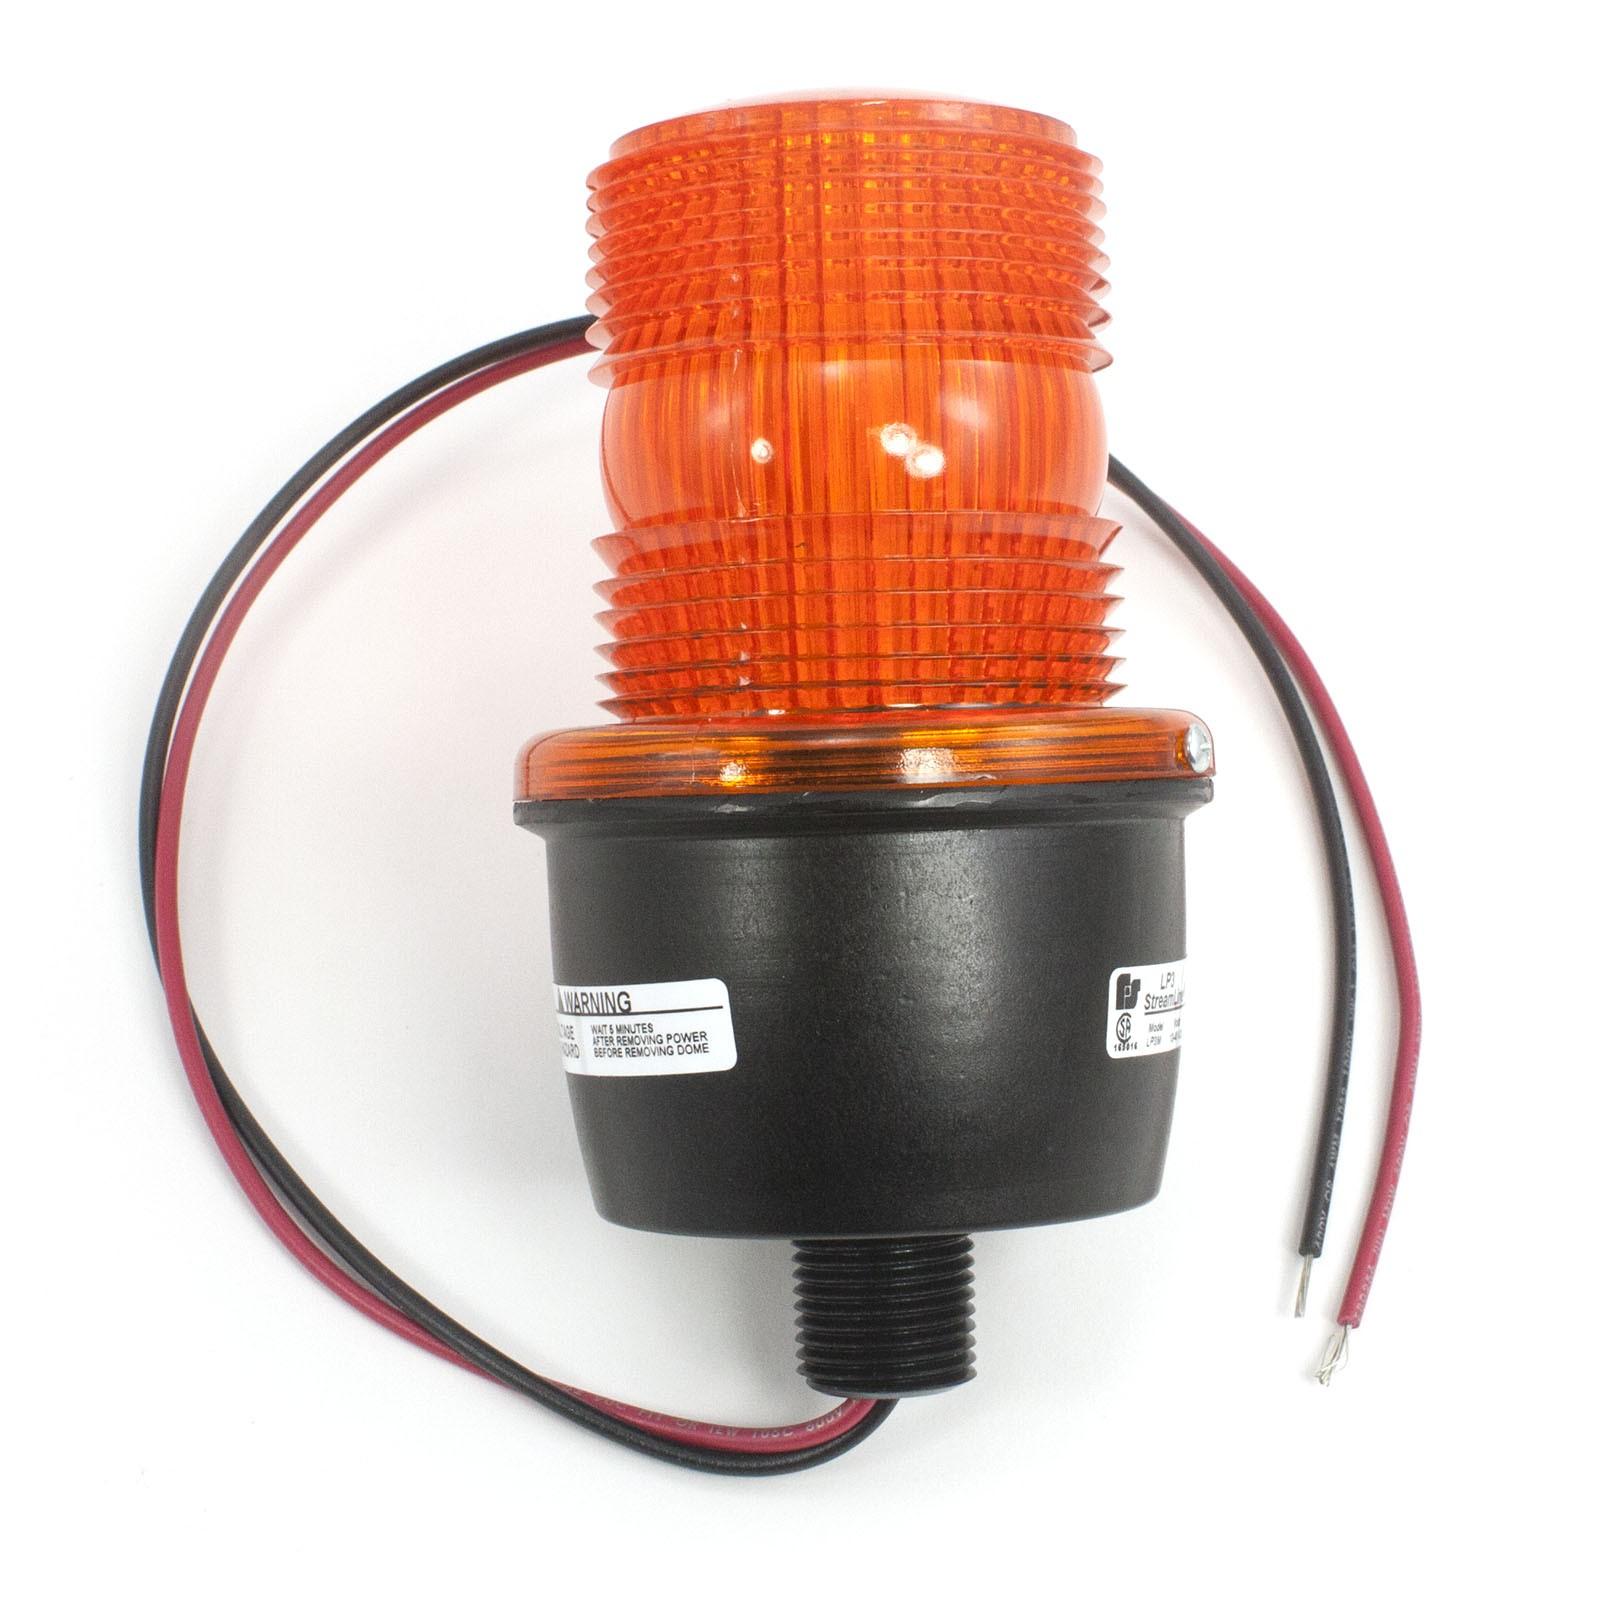 Linear Osco 2510-337: Flashing Strobe Signal Light (Amber